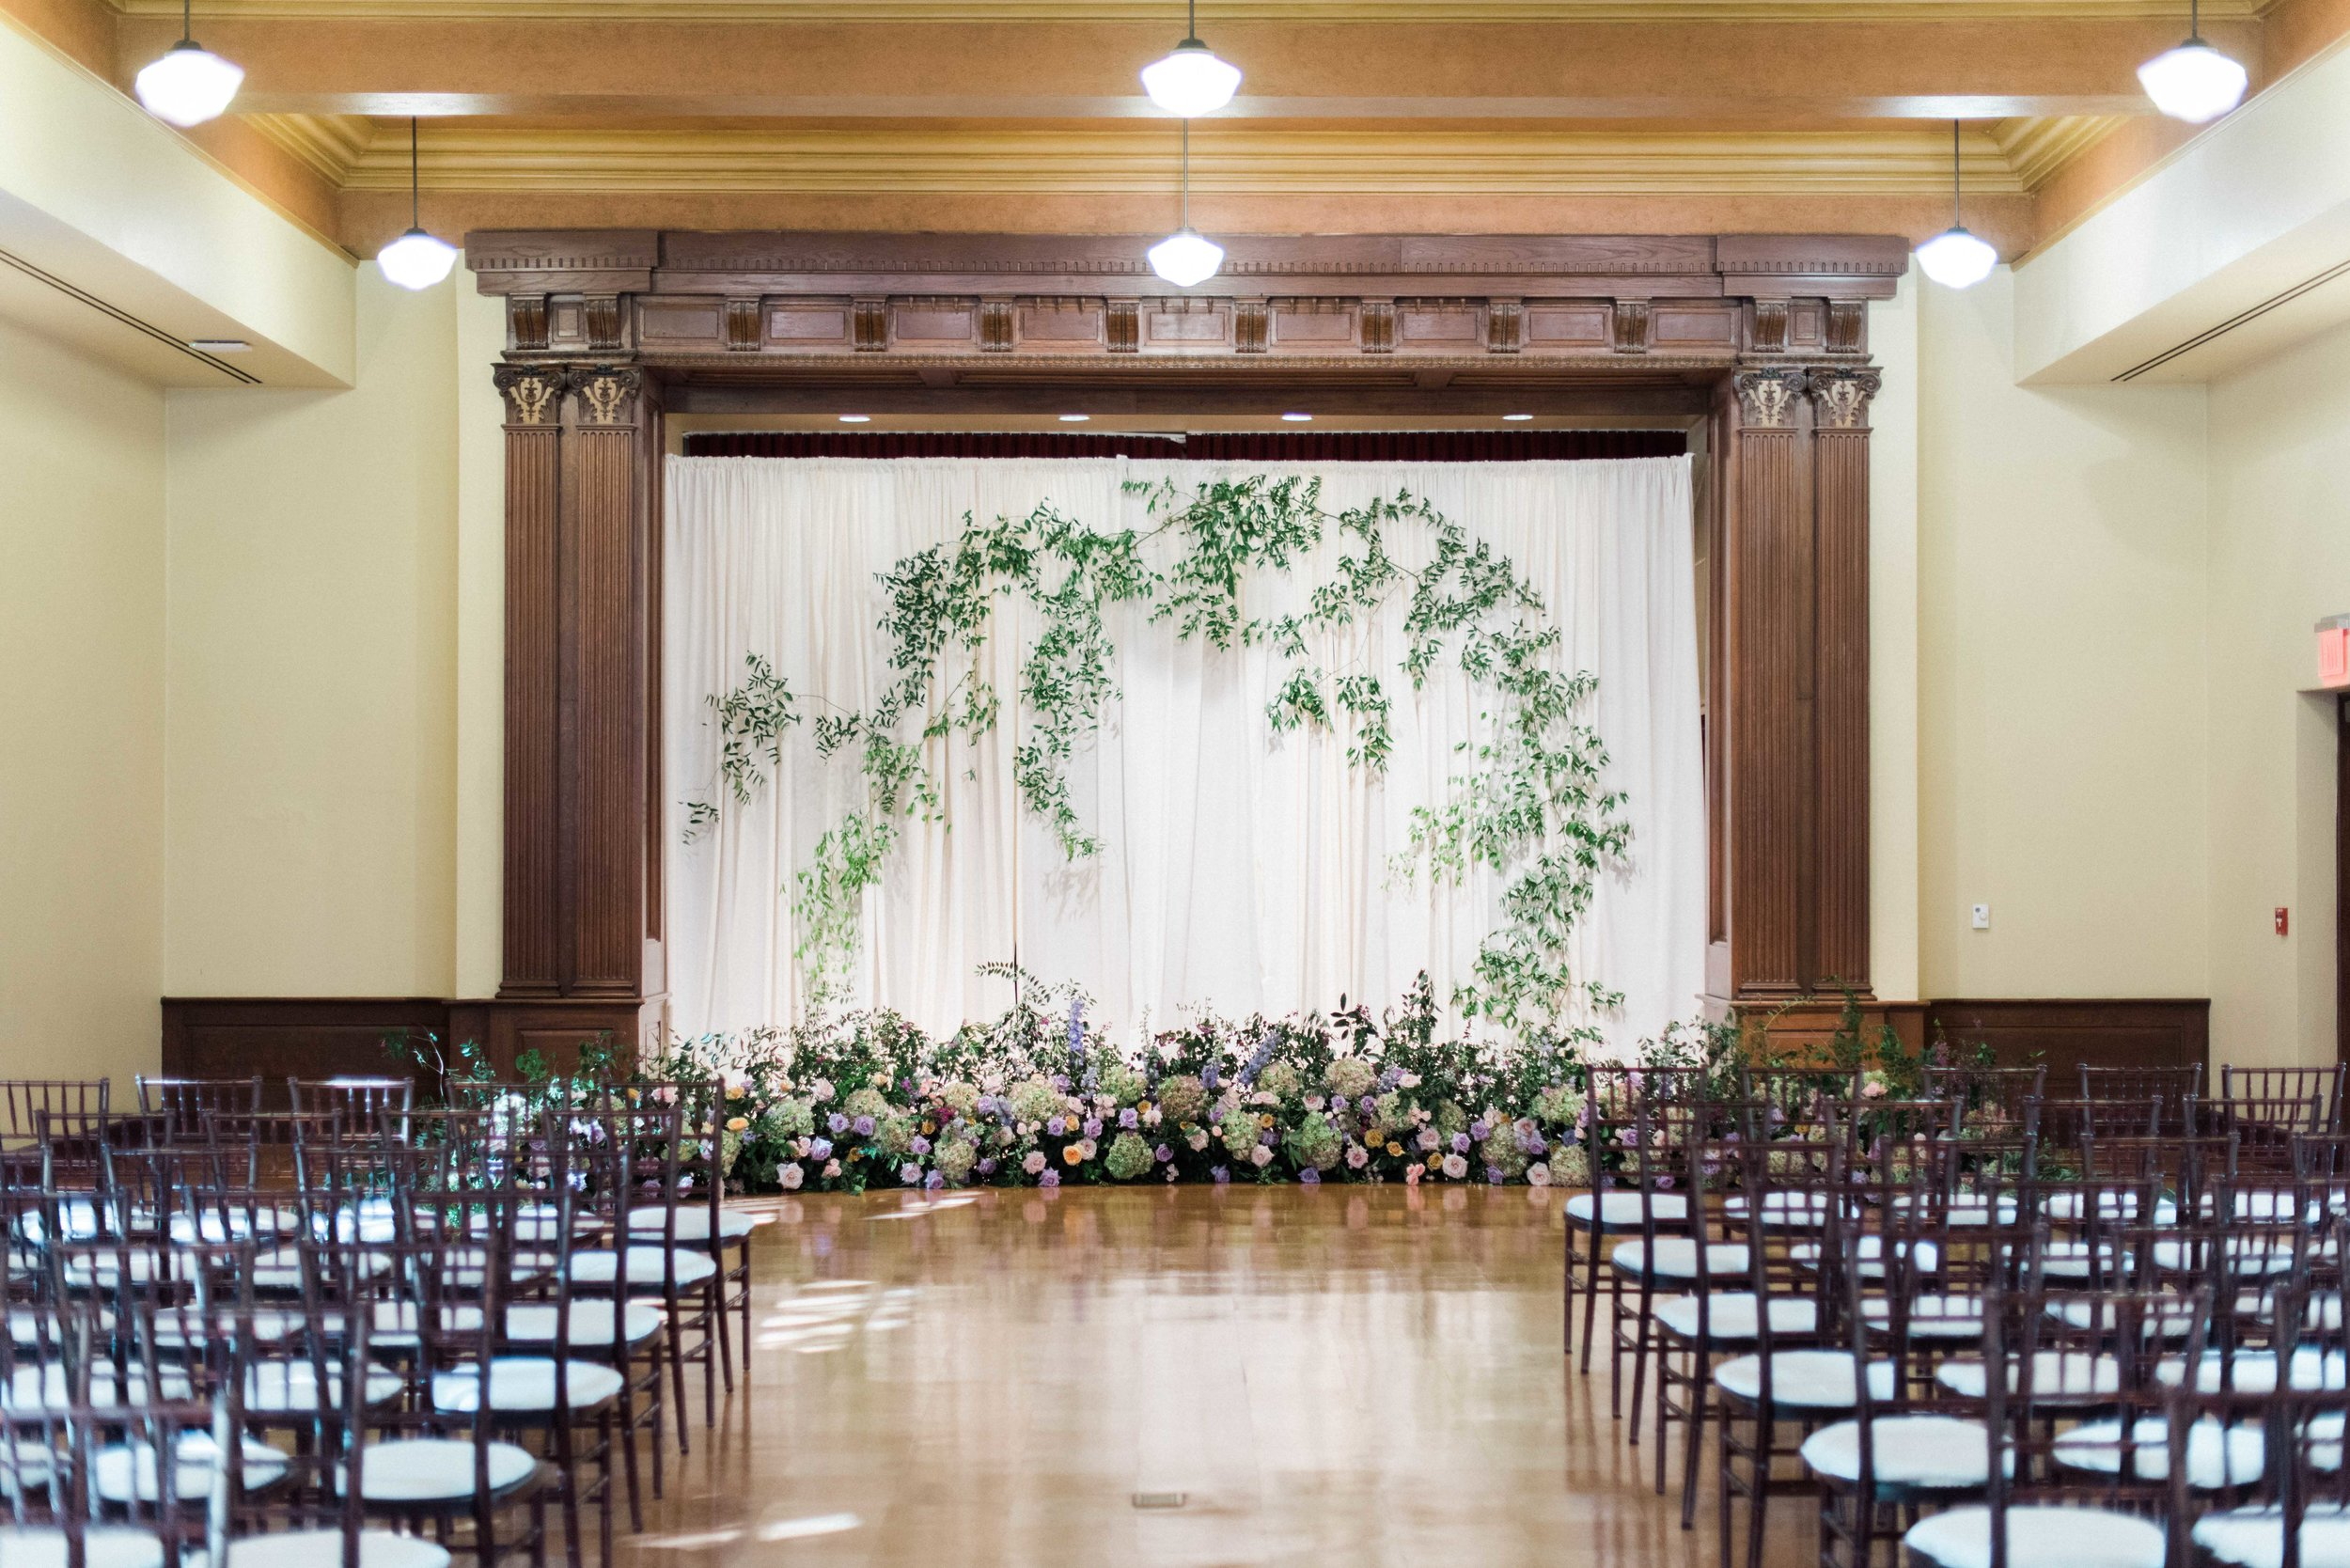 The-Knot-Texas-Fine-Art-Wedding-Film-Destination-Photographer-Houston-Austin-Dallas-New-Orleans-Julia-Ideson-Library-Event-Dana-Josh-Fernandez-Photograph-Top-Best-5.jpg